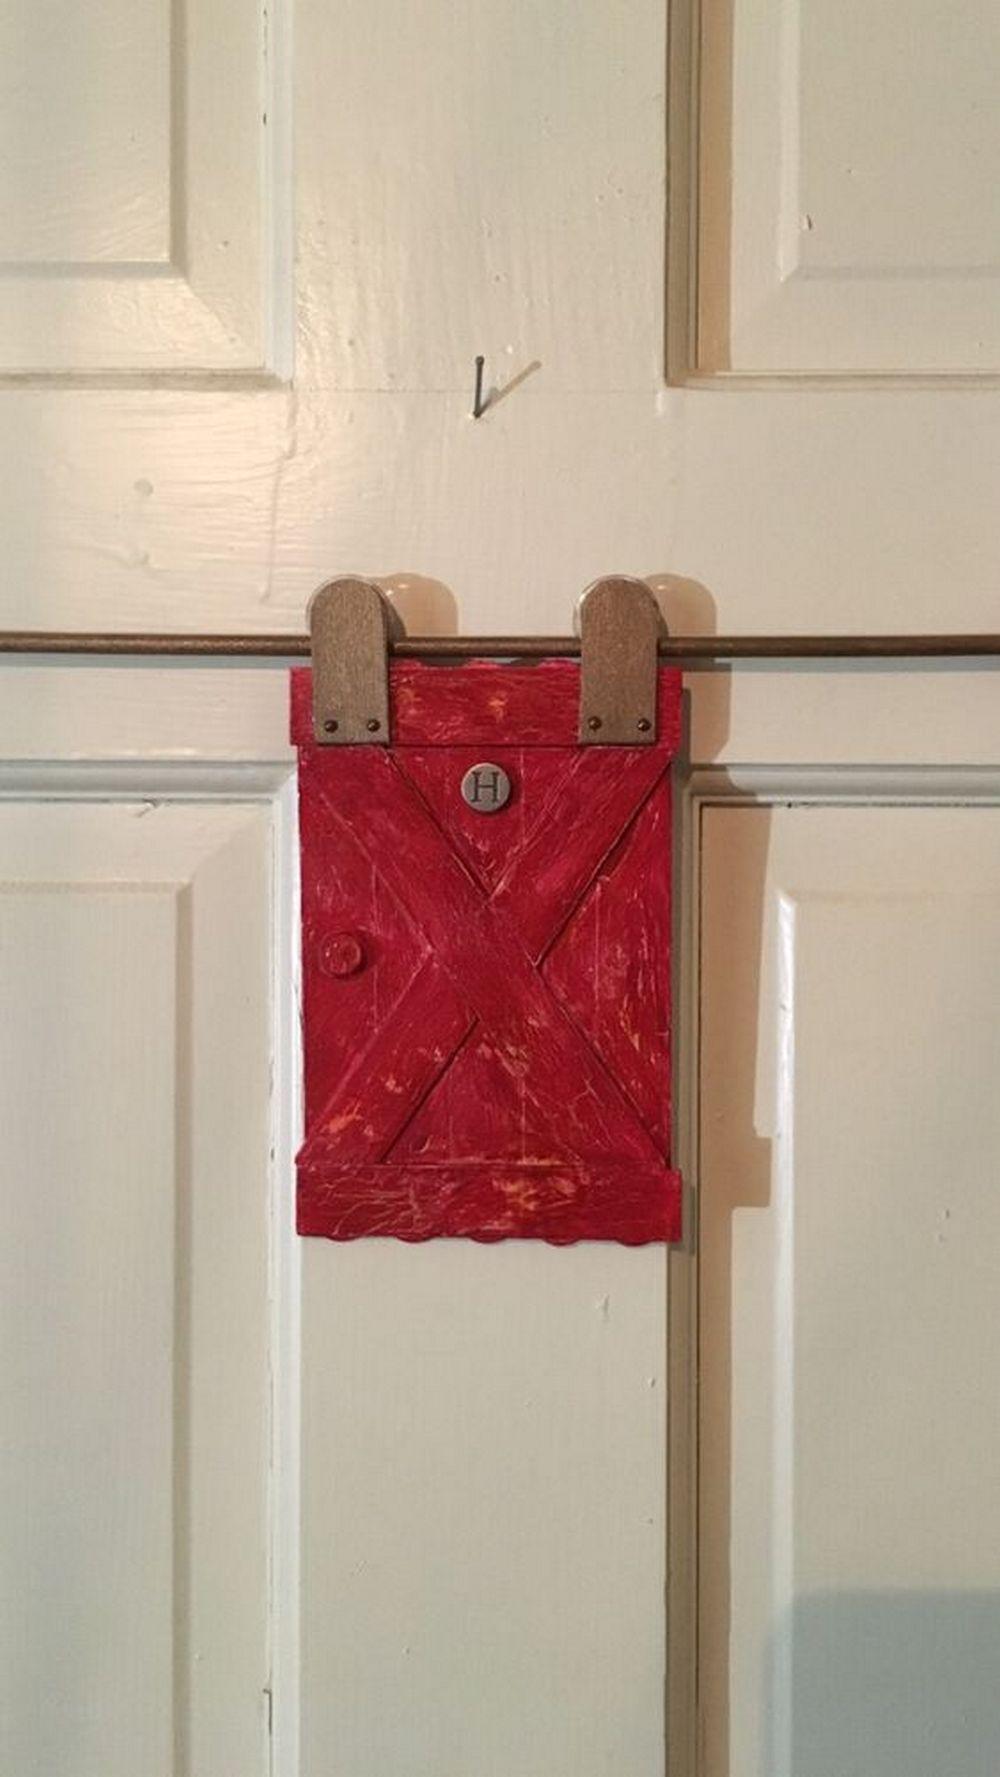 Diy Barn Door Peephole Cover Diy Projects For Everyone